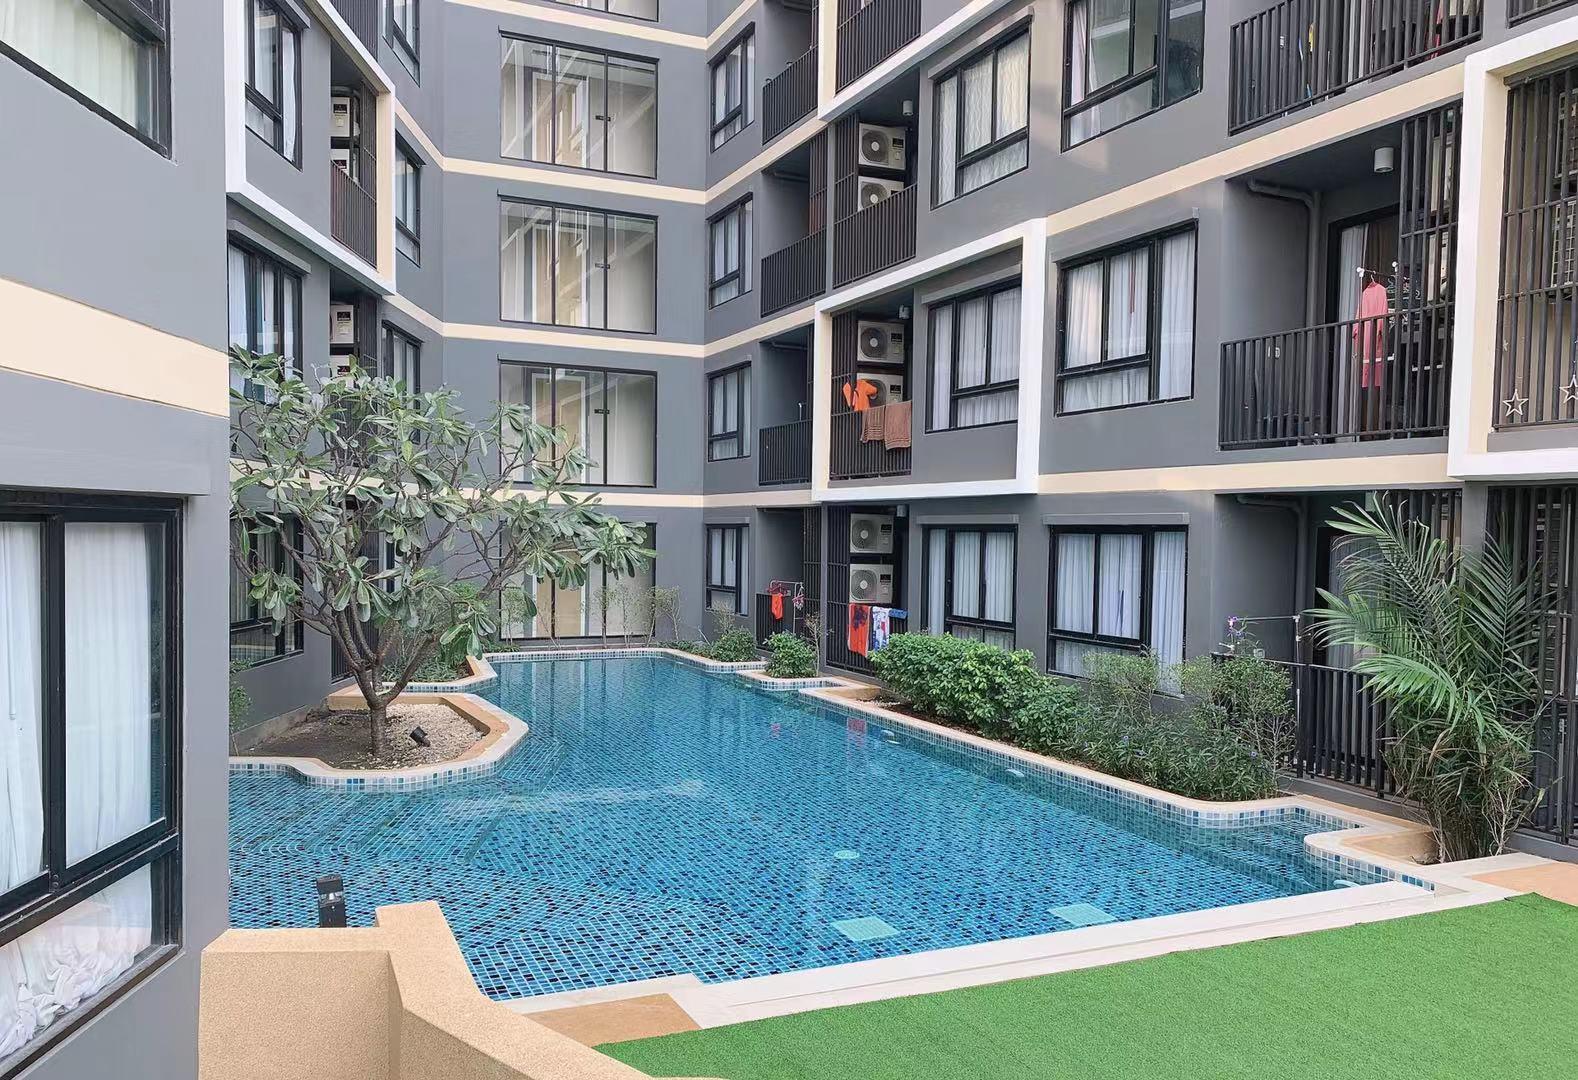 Pattaya Downtown THE URBAN ATTITUDE  Deluxe pool อพาร์ตเมนต์ 1 ห้องนอน 1 ห้องน้ำส่วนตัว ขนาด 50 ตร.ม. – พัทยากลาง